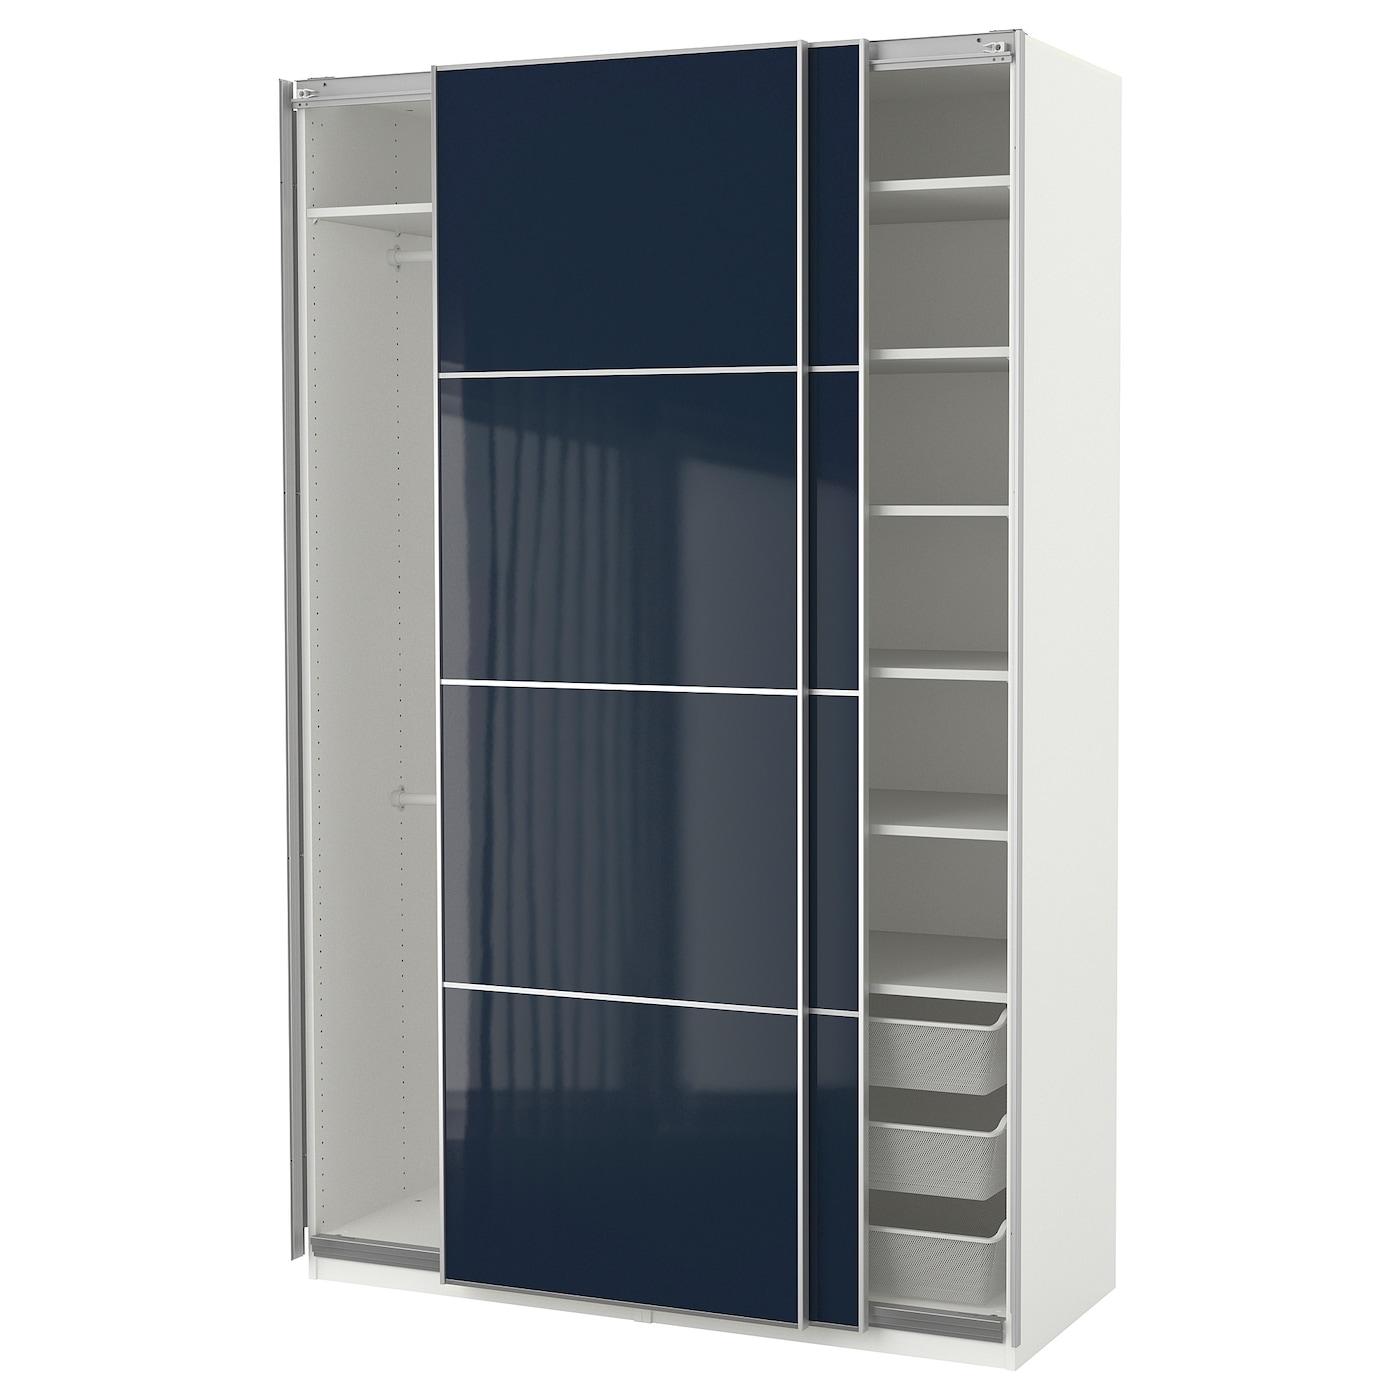 Pax wardrobe white hokksund high gloss black blue - Ikea armoire portes coulissantes ...